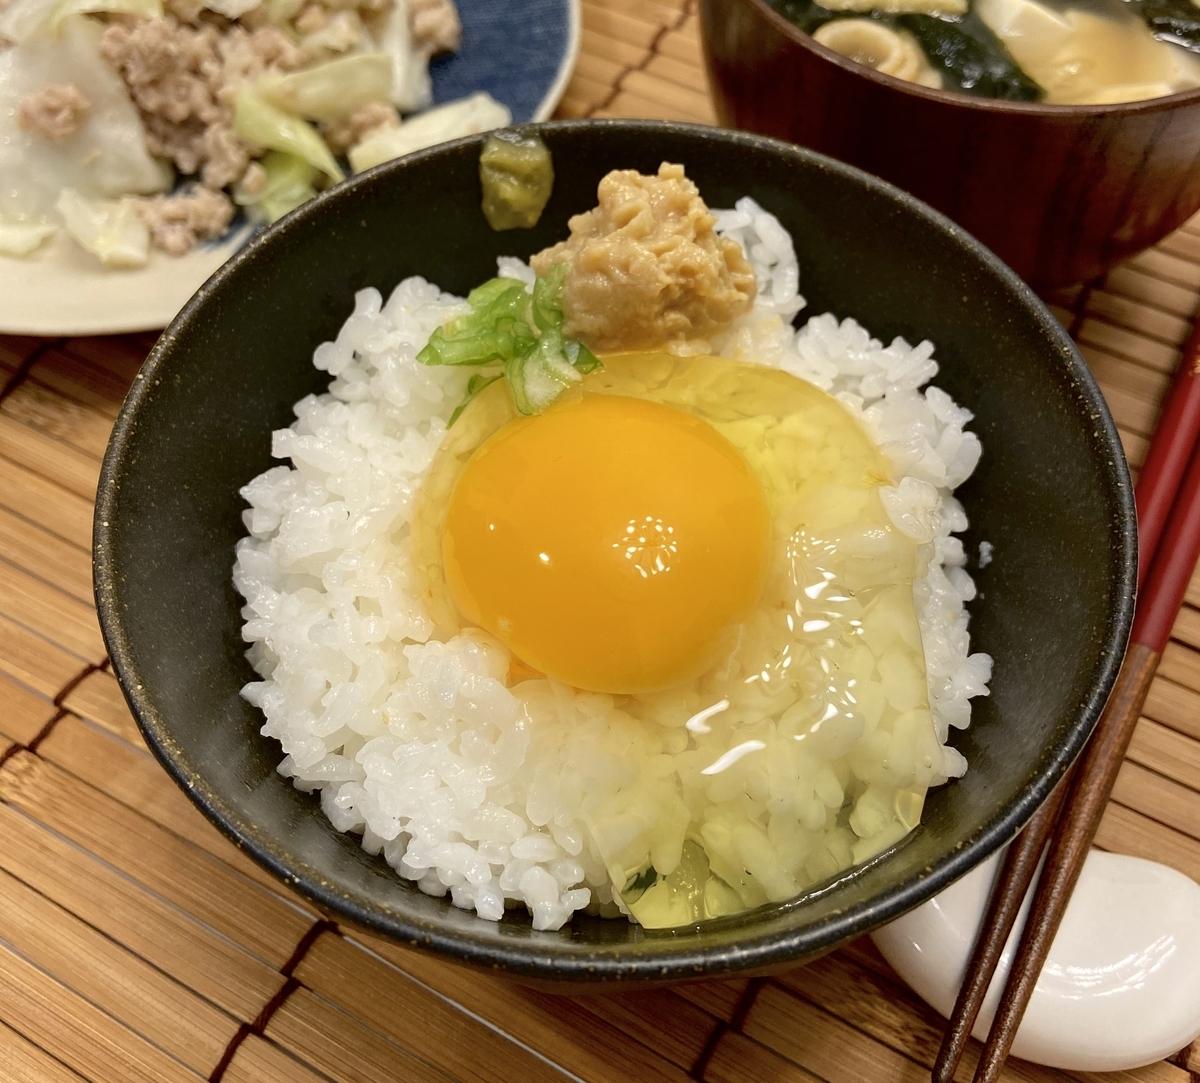 f:id:tsukushi-hochiminh:20191127230745j:plain